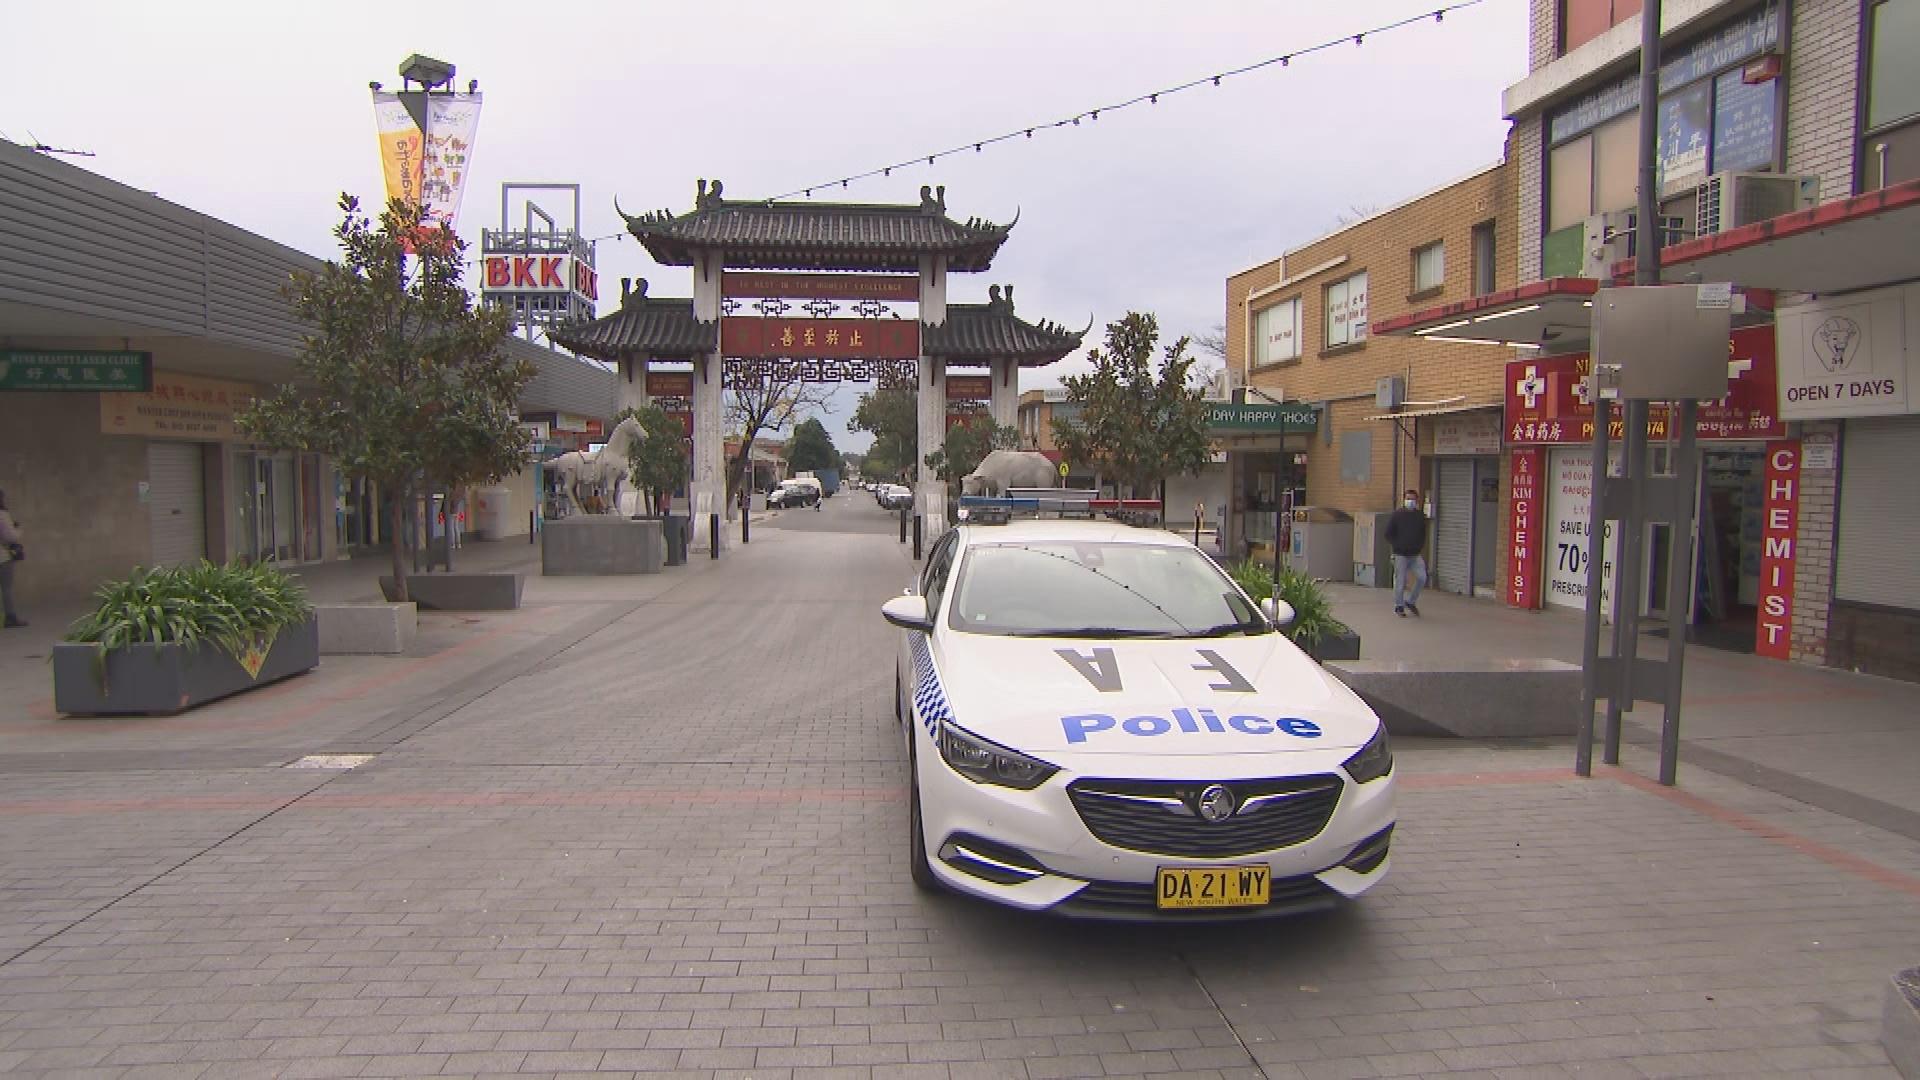 Police patrols Cabramatta